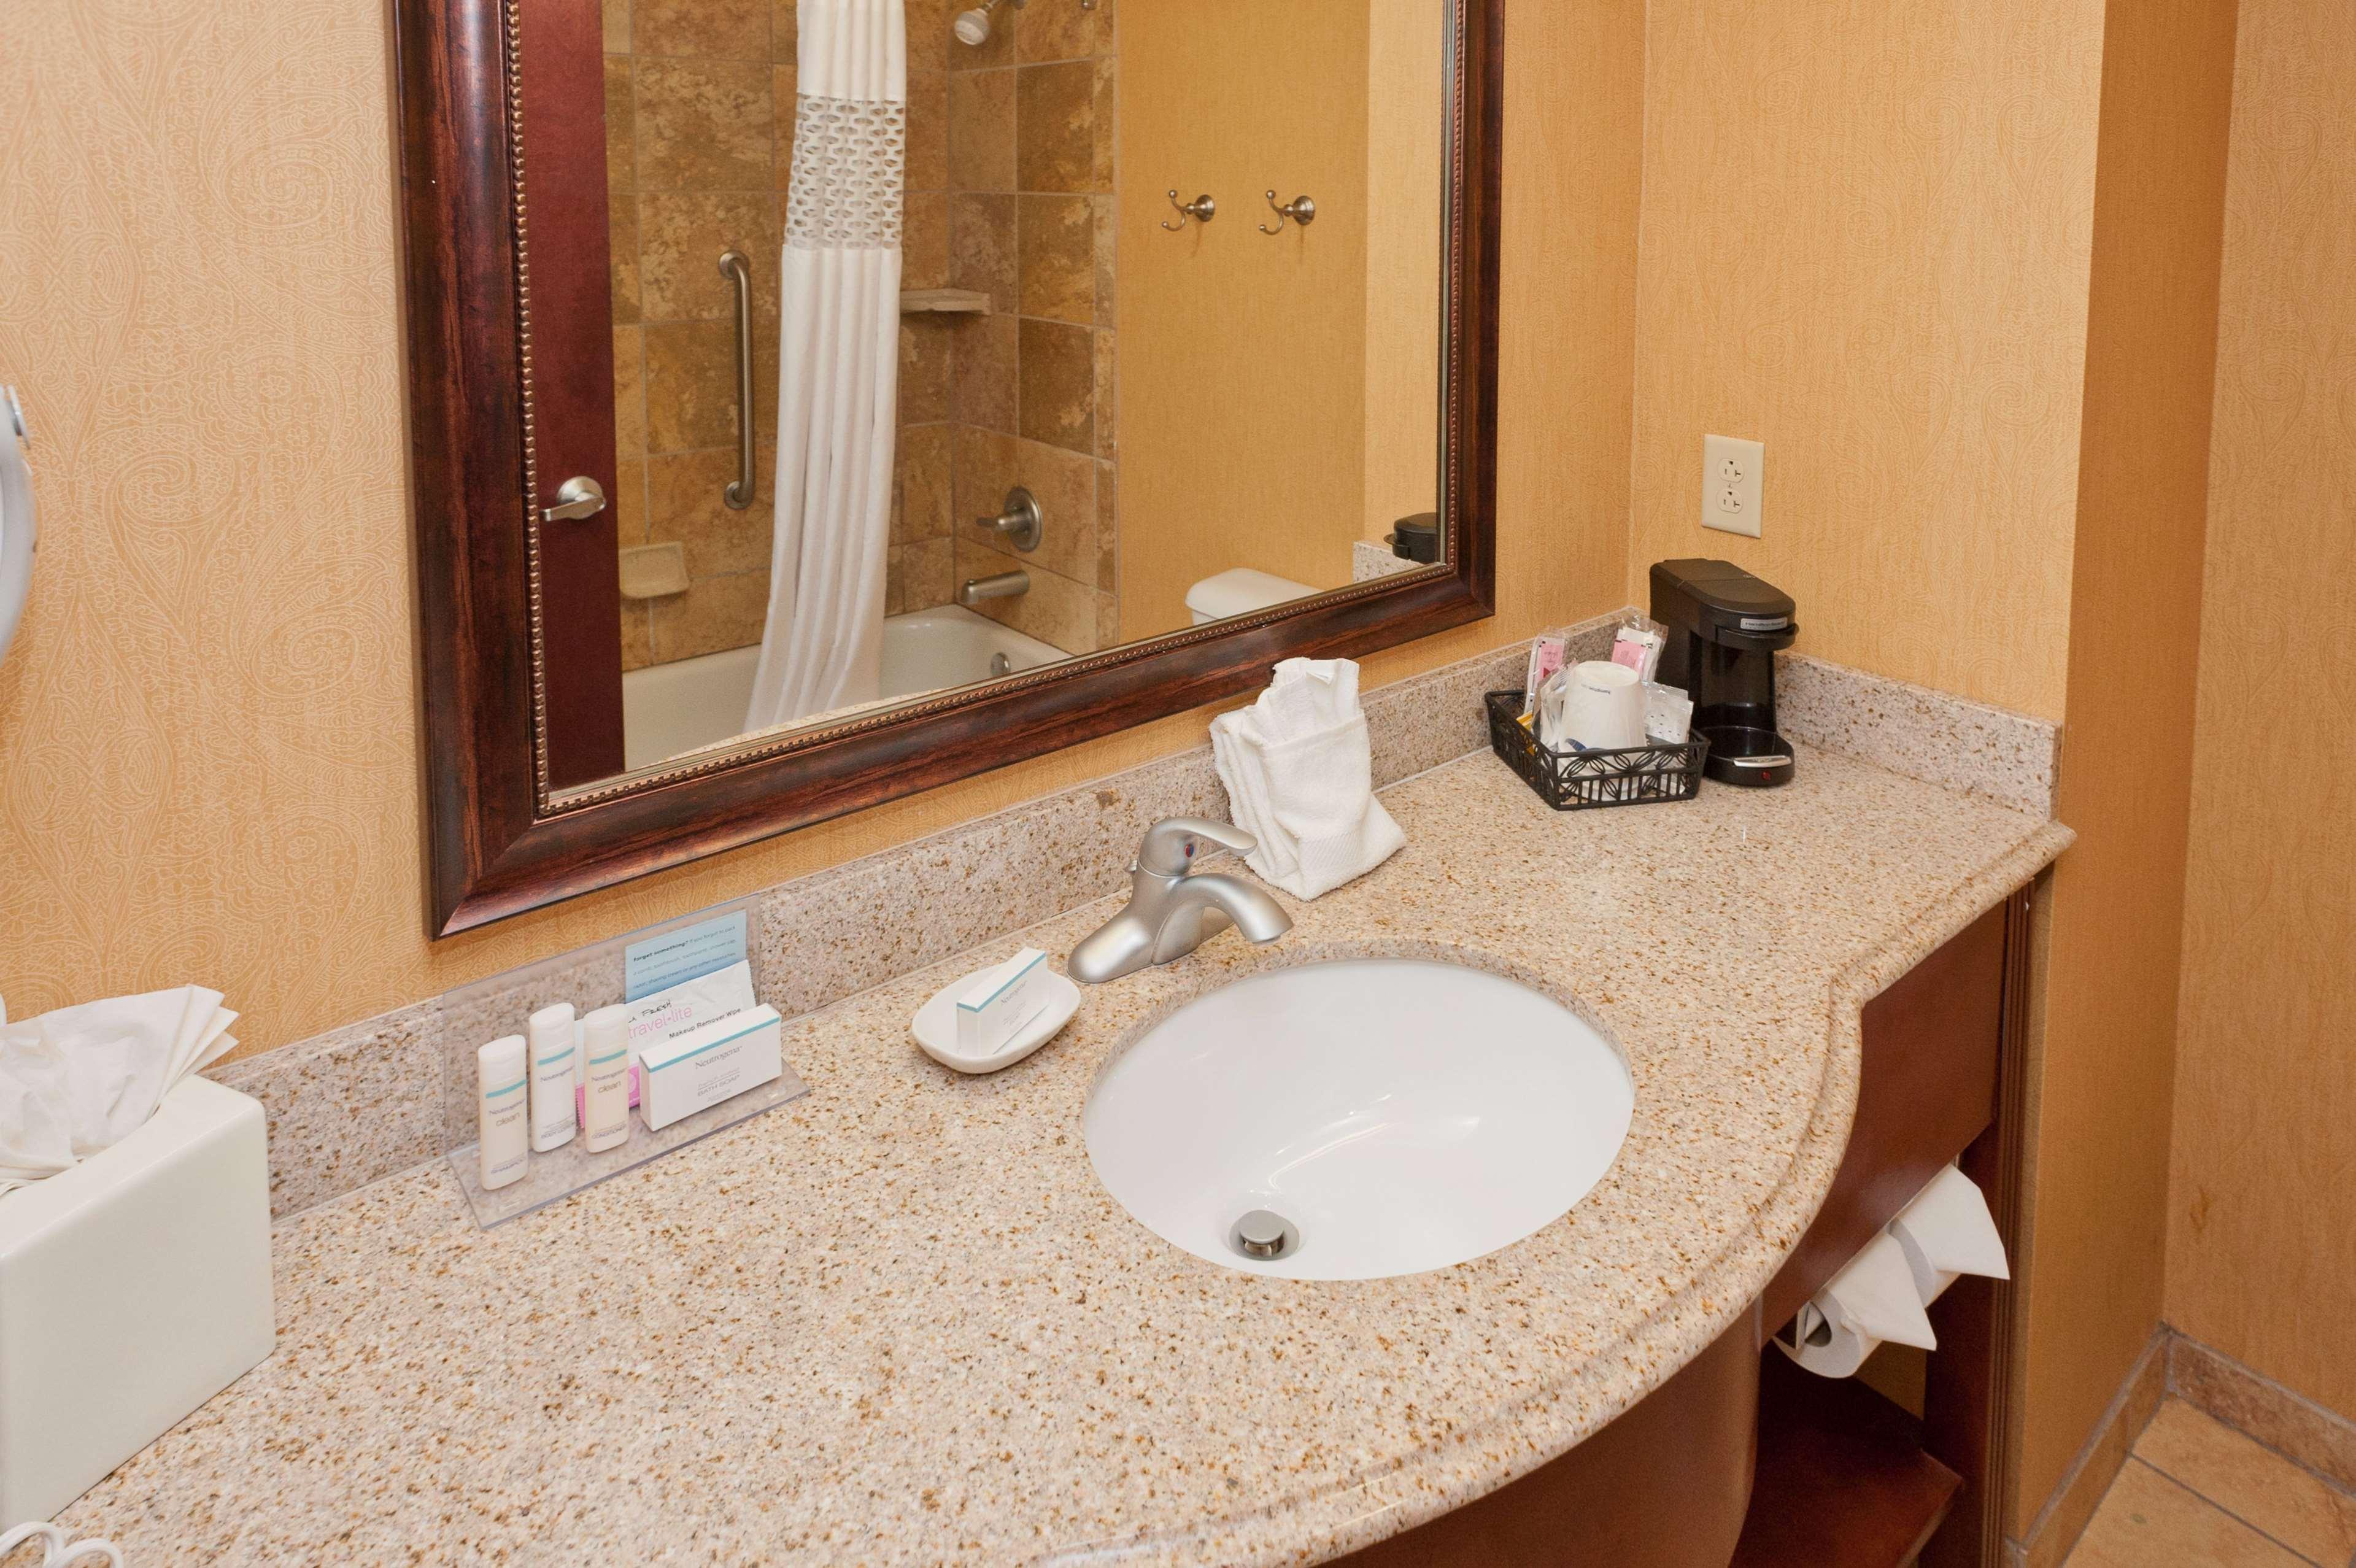 Hampton Inn & Suites Thibodaux image 10